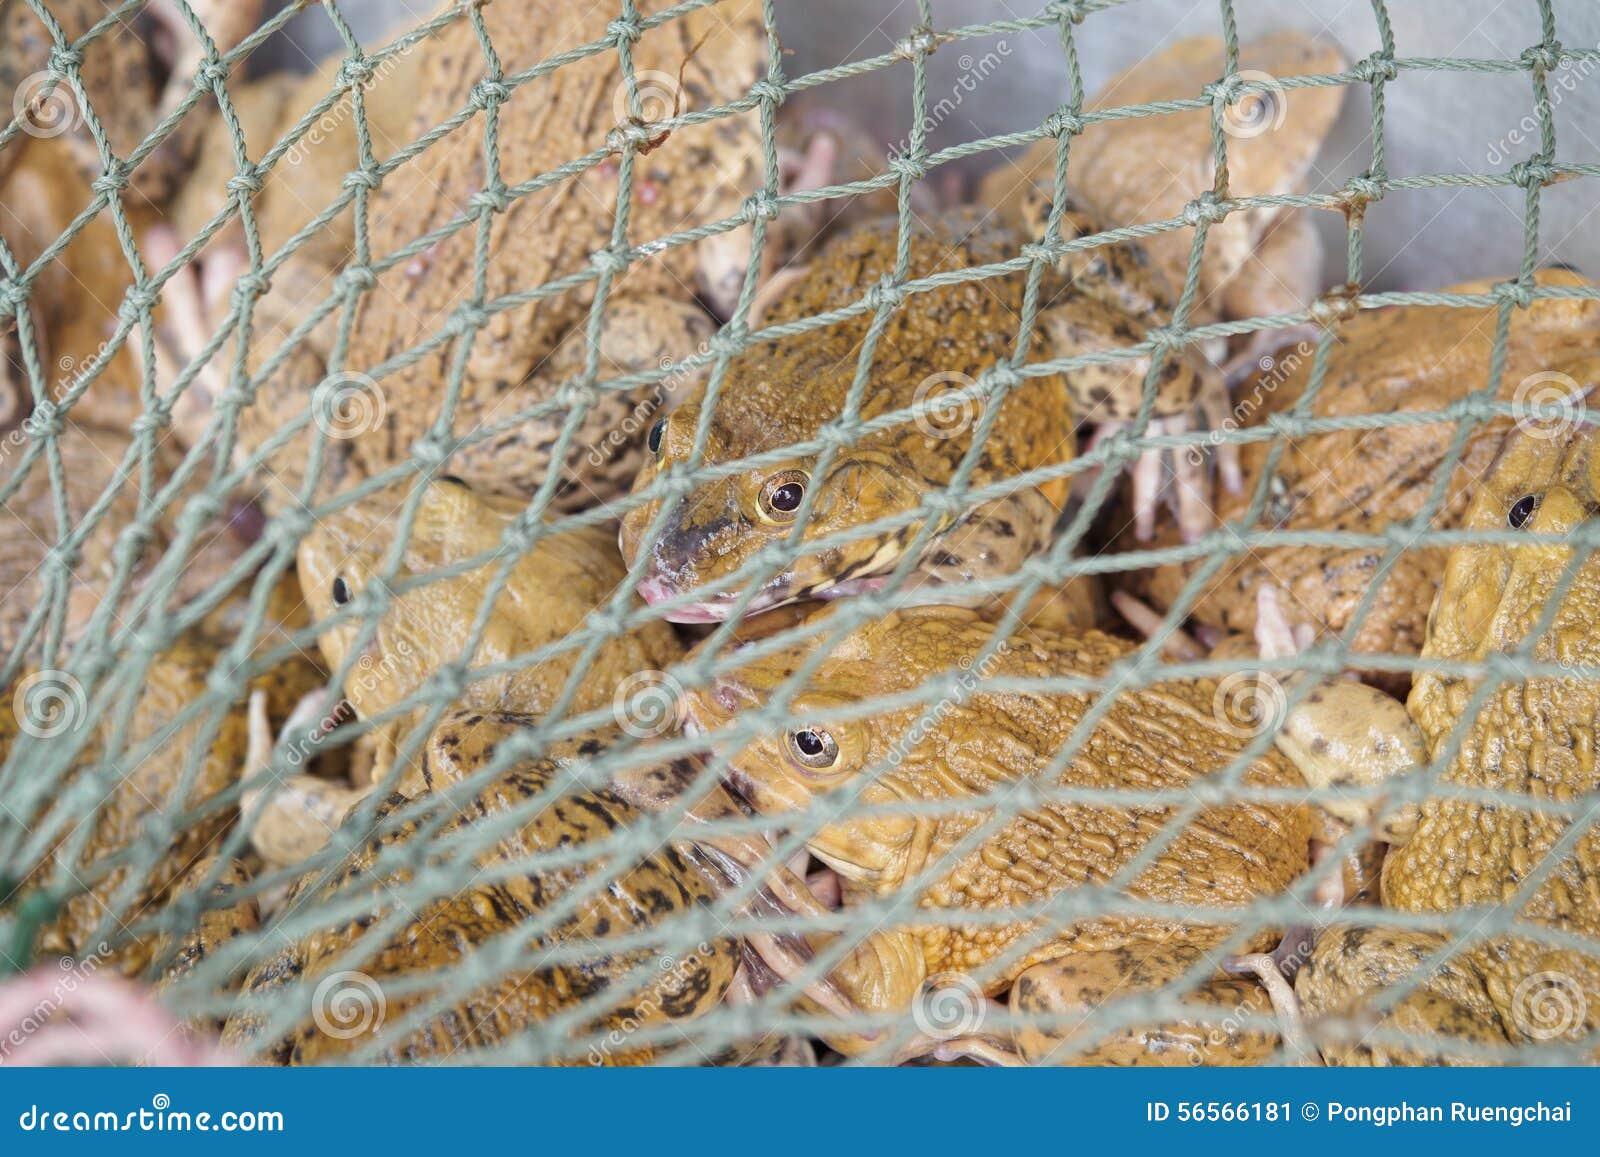 Download Βάτραχοι σε ένα δίχτυ στοκ εικόνα. εικόνα από βάτραχοι - 56566181